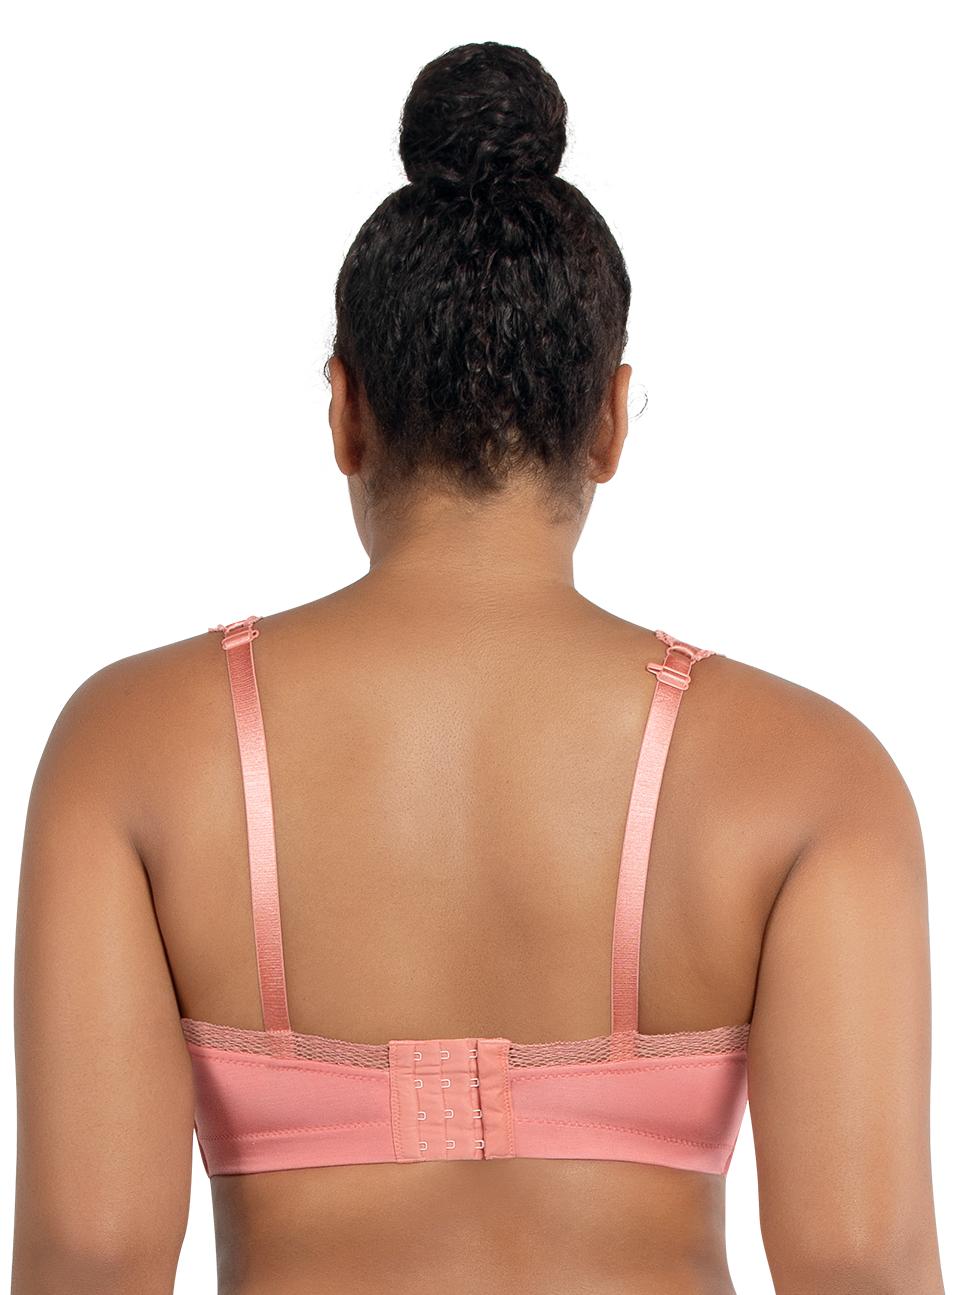 PARFAIT Dalis BraletteP5641 PinkBlush Back - Dalis Bralette - Pink Blush - P5641